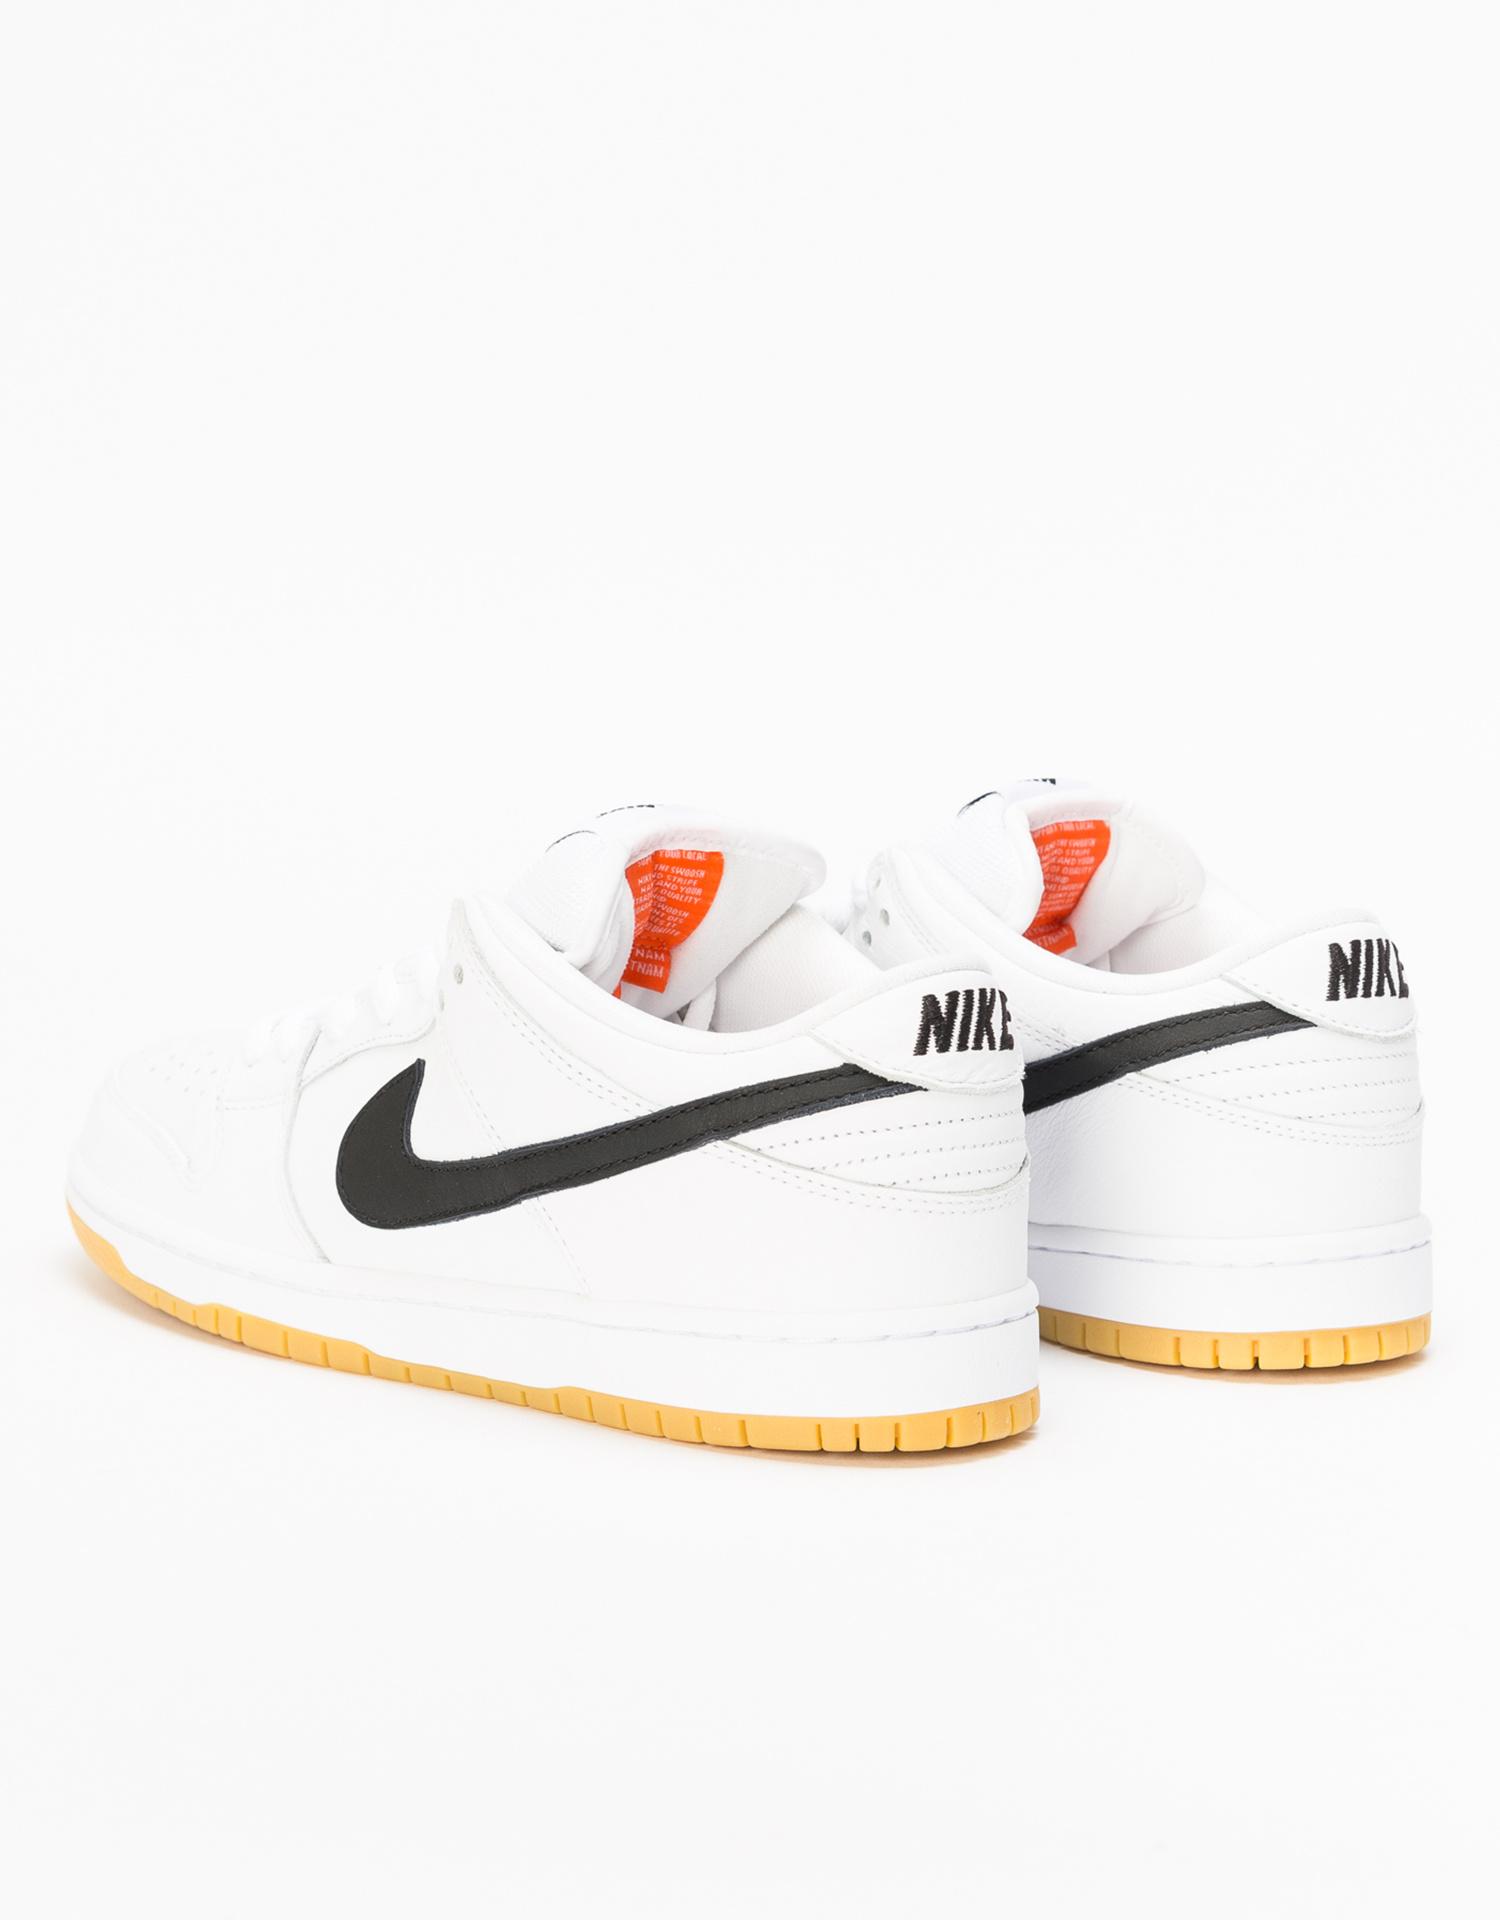 Nike SB Dunk Low Pro Iso Orange Label  white/black-white-gum light brown